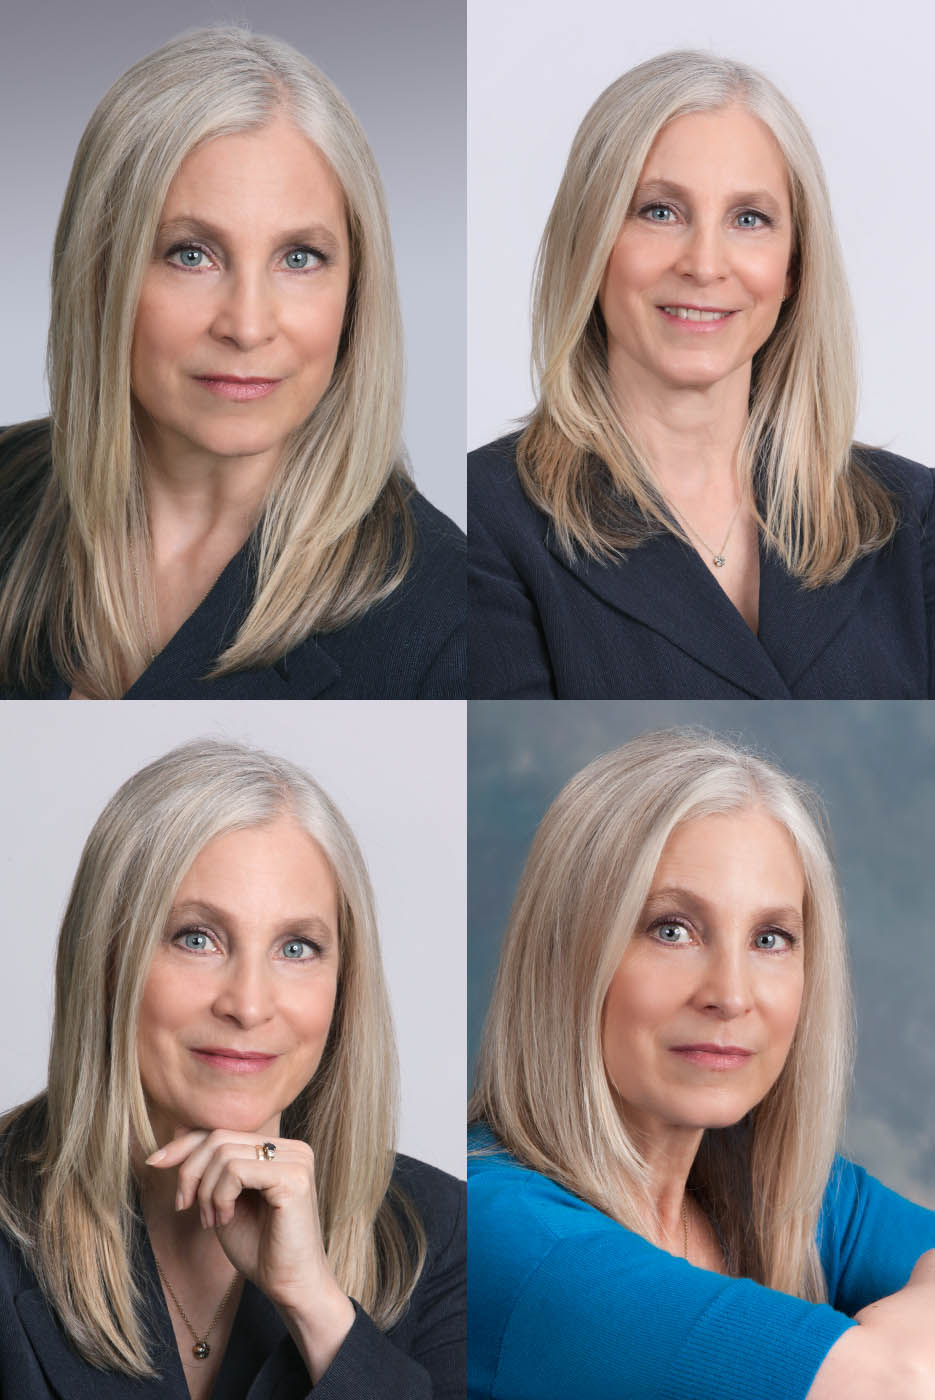 composite of female branding headshots